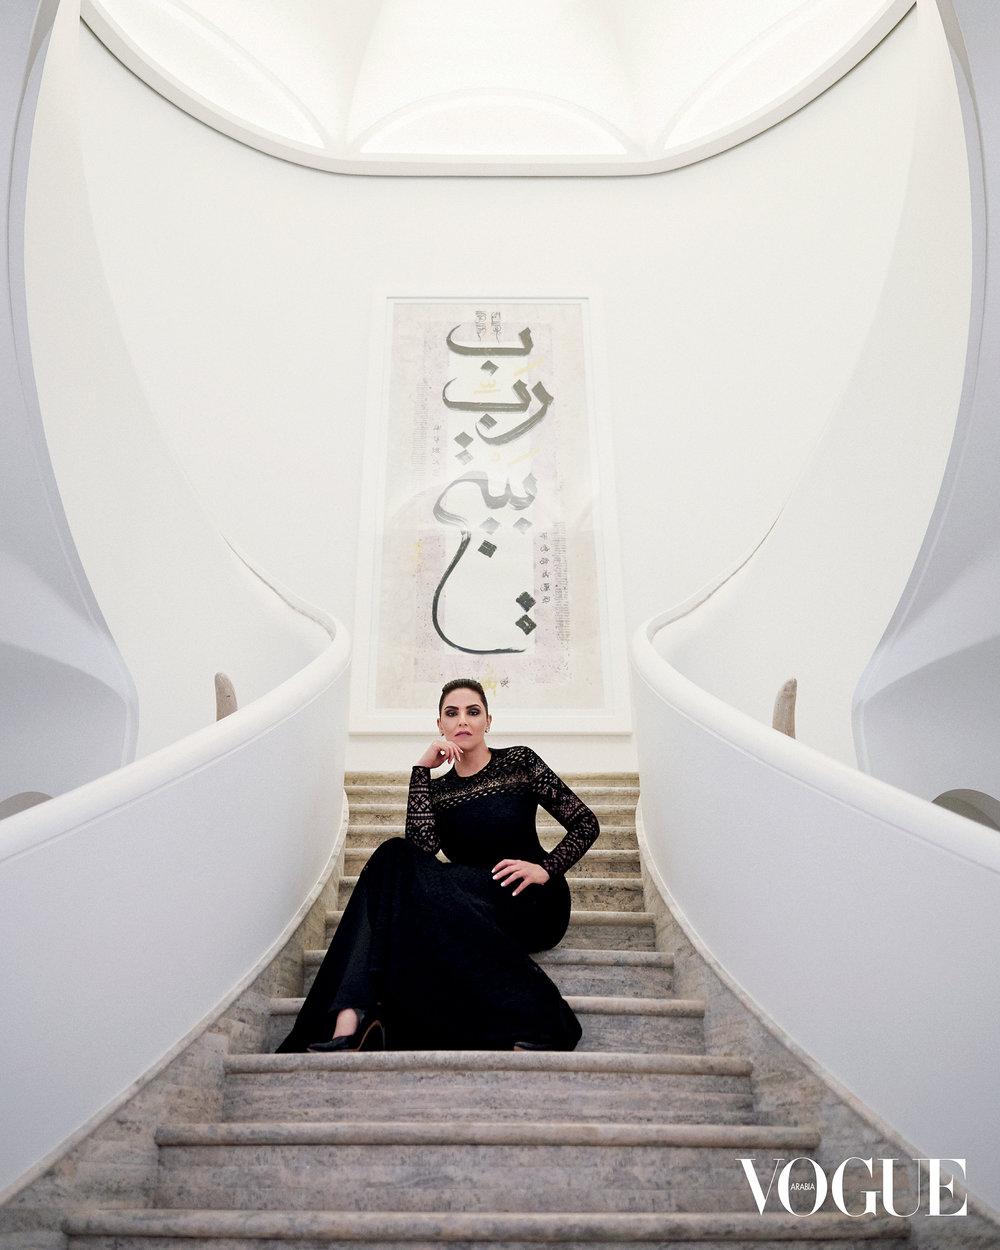 Portrait  /// Sheikha Majda Al Sabah for VOGUE Arabia Magazine, October Issue 2018.   FASHION, EDITORIAL, PORTRAITURE